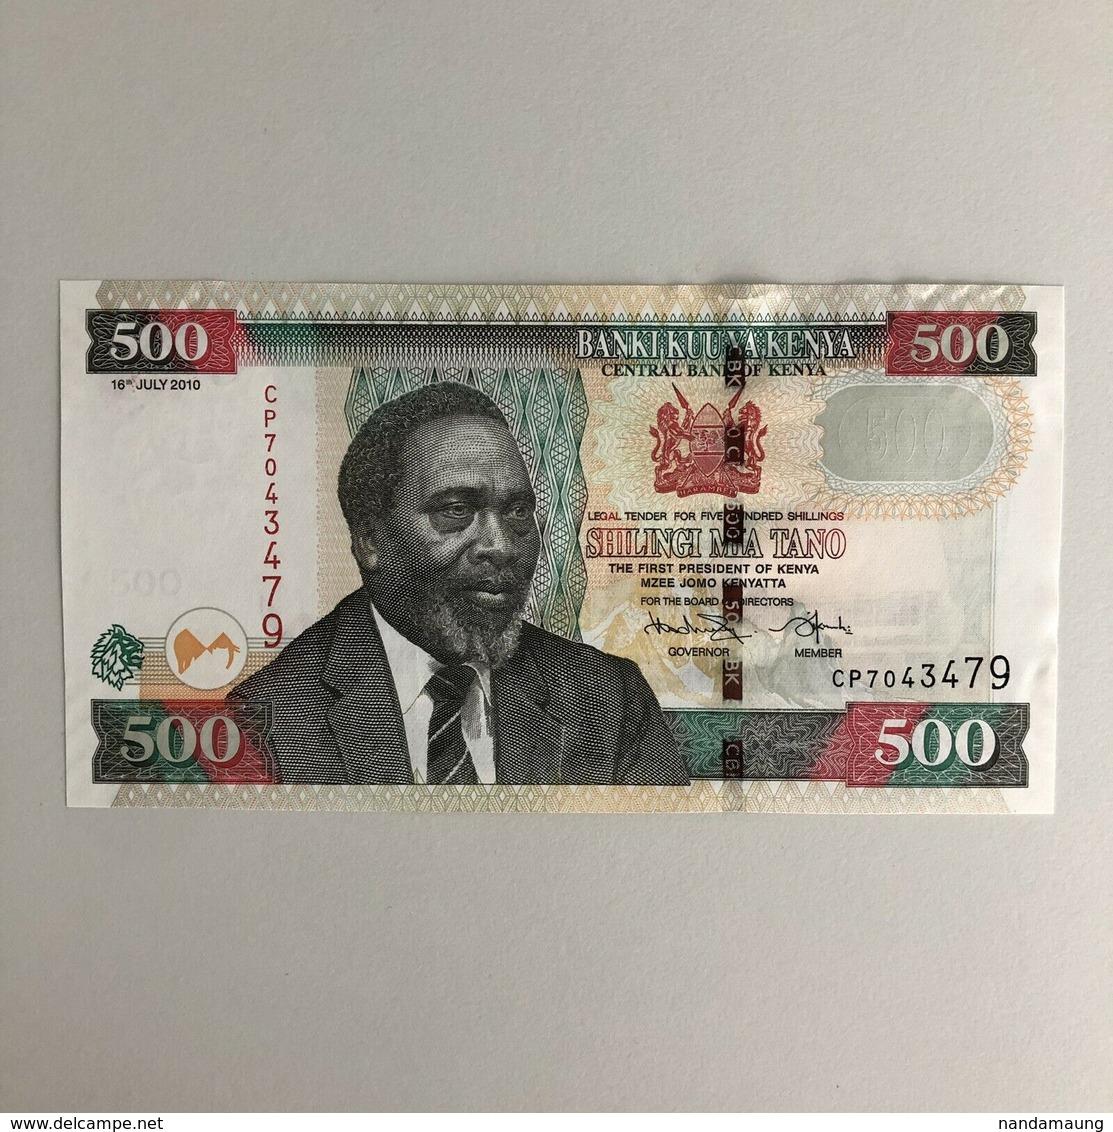 Kenya 500 Shillings Banknote (Dated 16th July 2010) UNC - Kenia